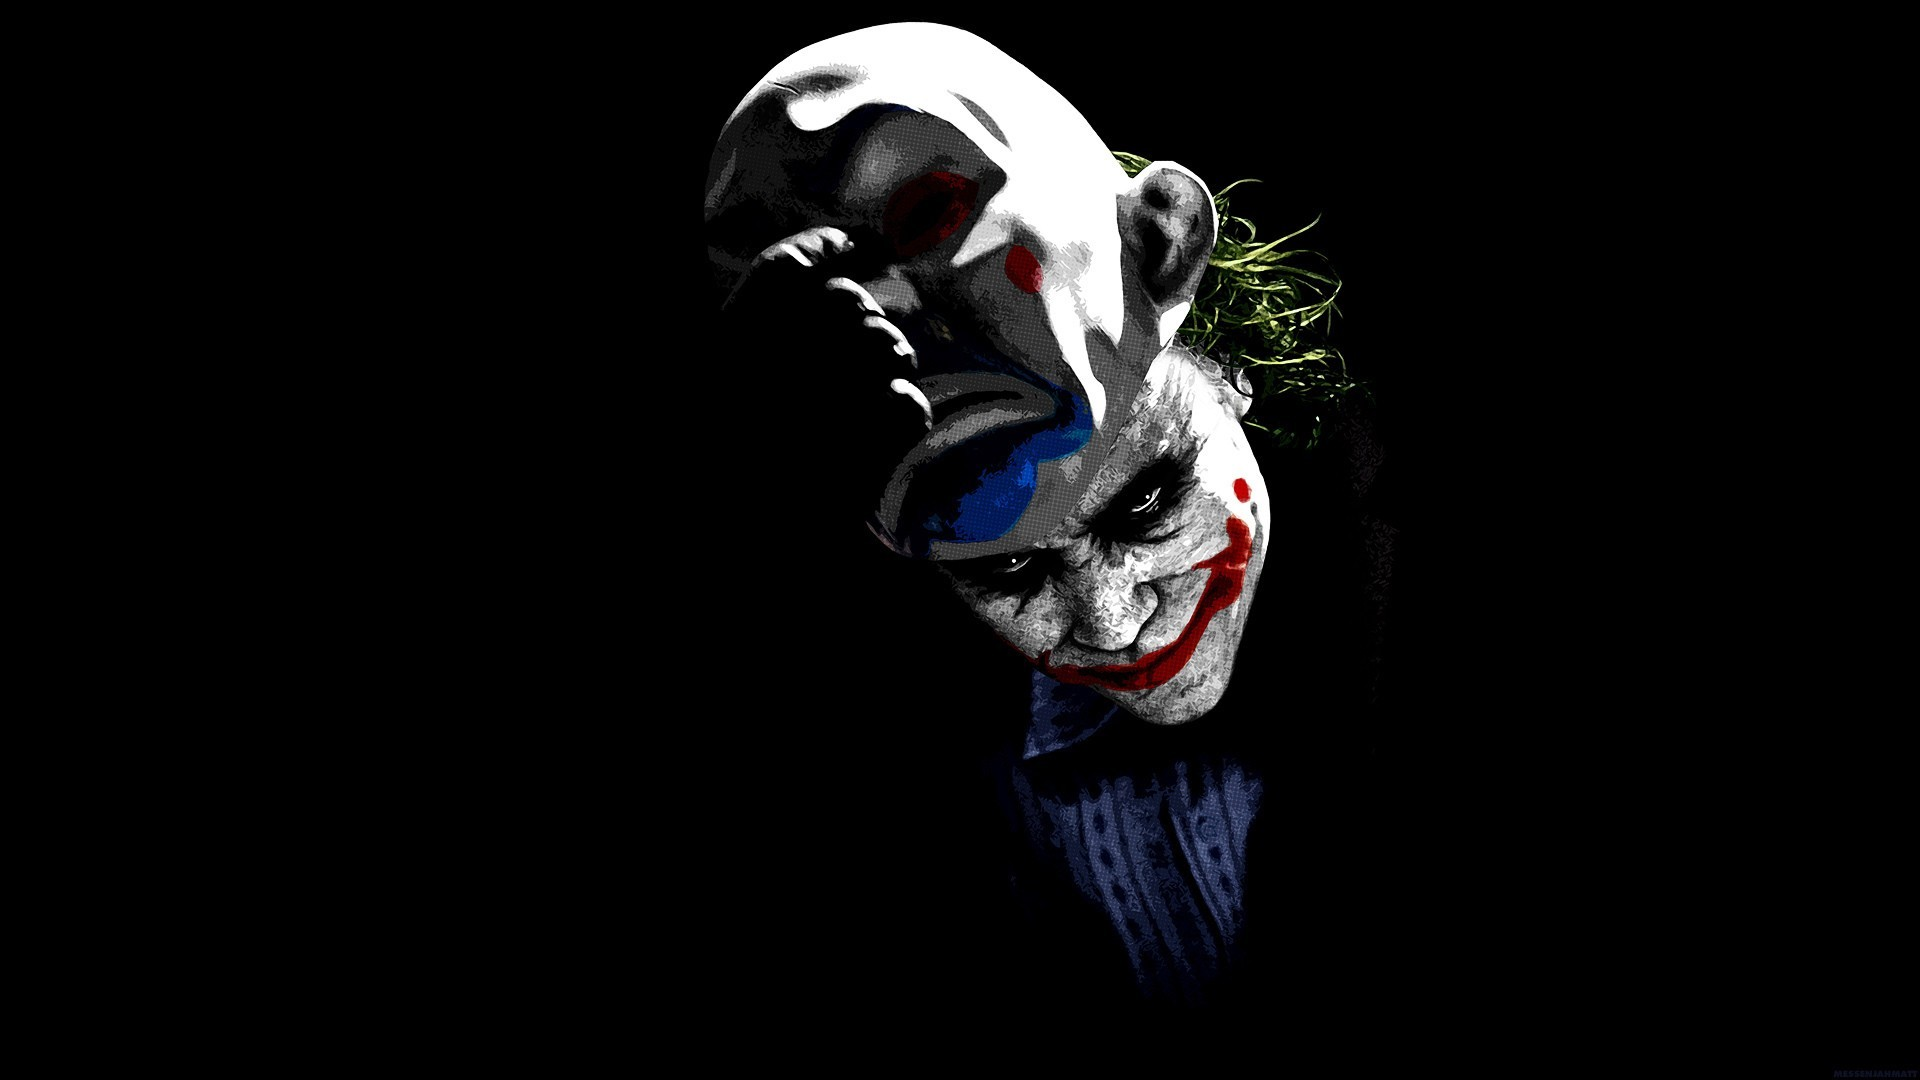 0 The Joker Wallpapers | WallpaperSafari joker wallpapers WallpaperUP